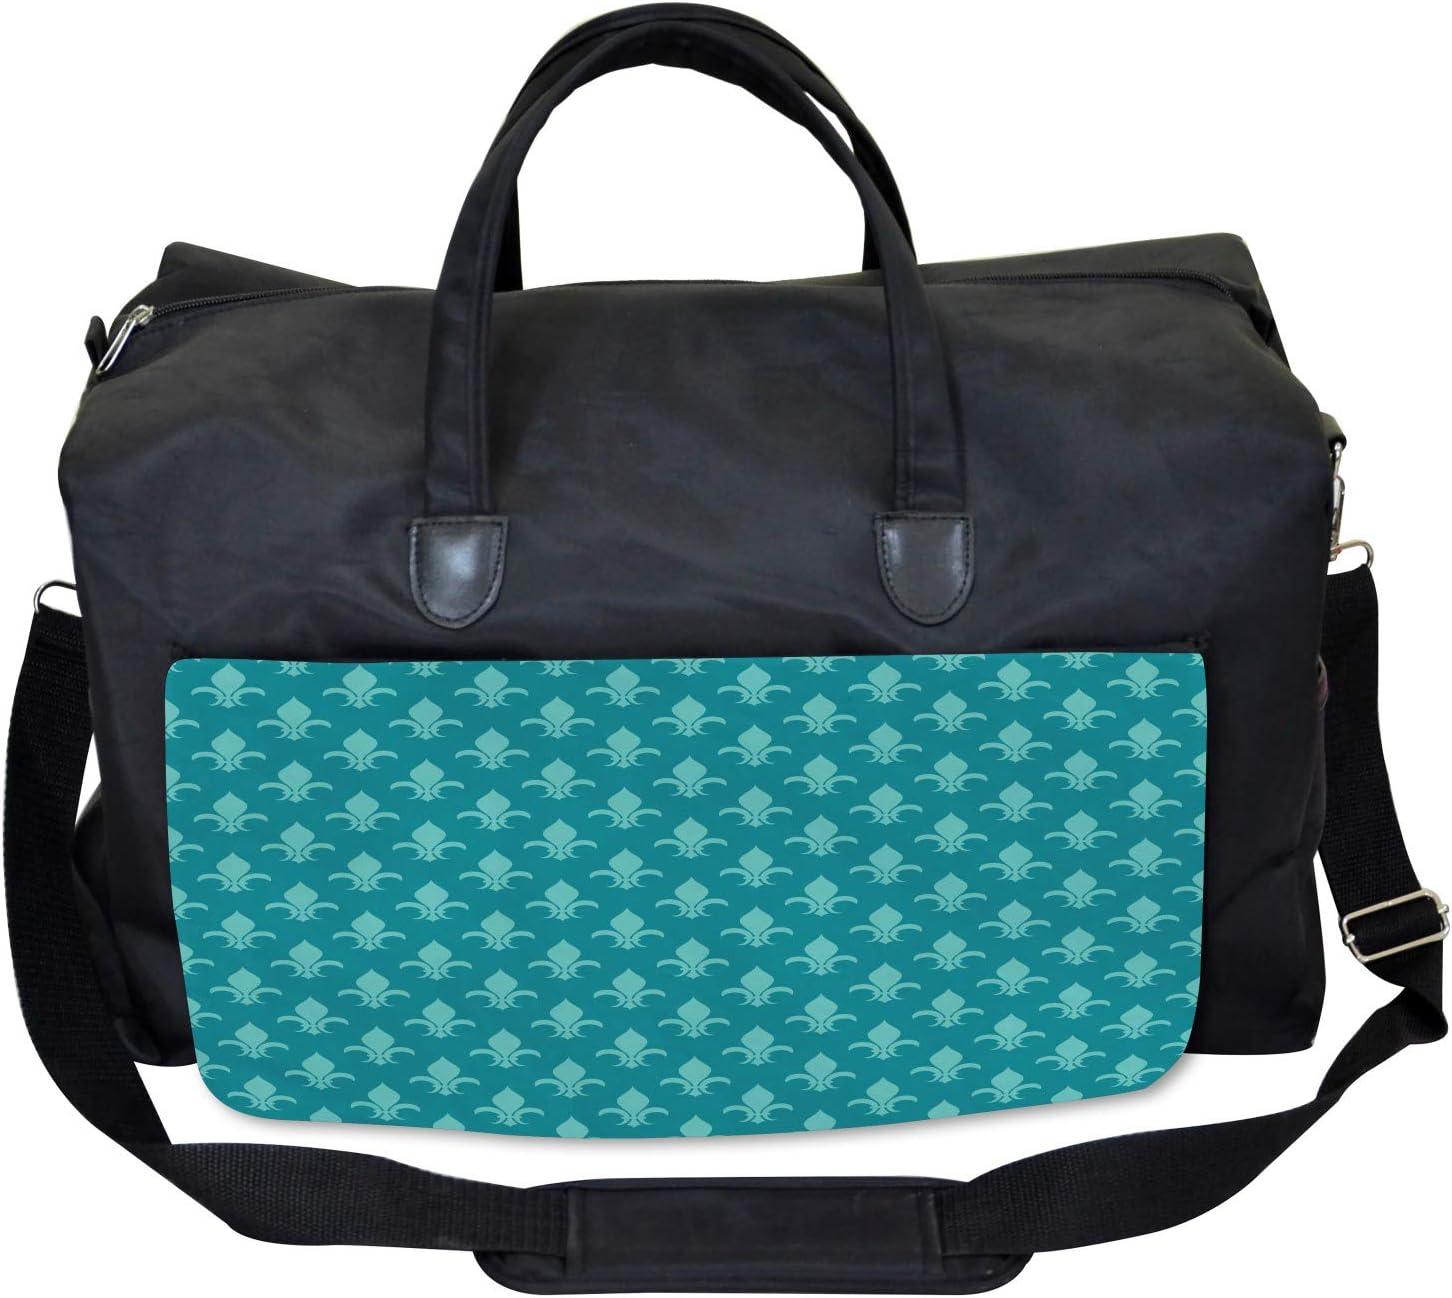 Retro Damask Pattern Ambesonne Fleur de Lis Gym Bag Large Weekender Carry-on